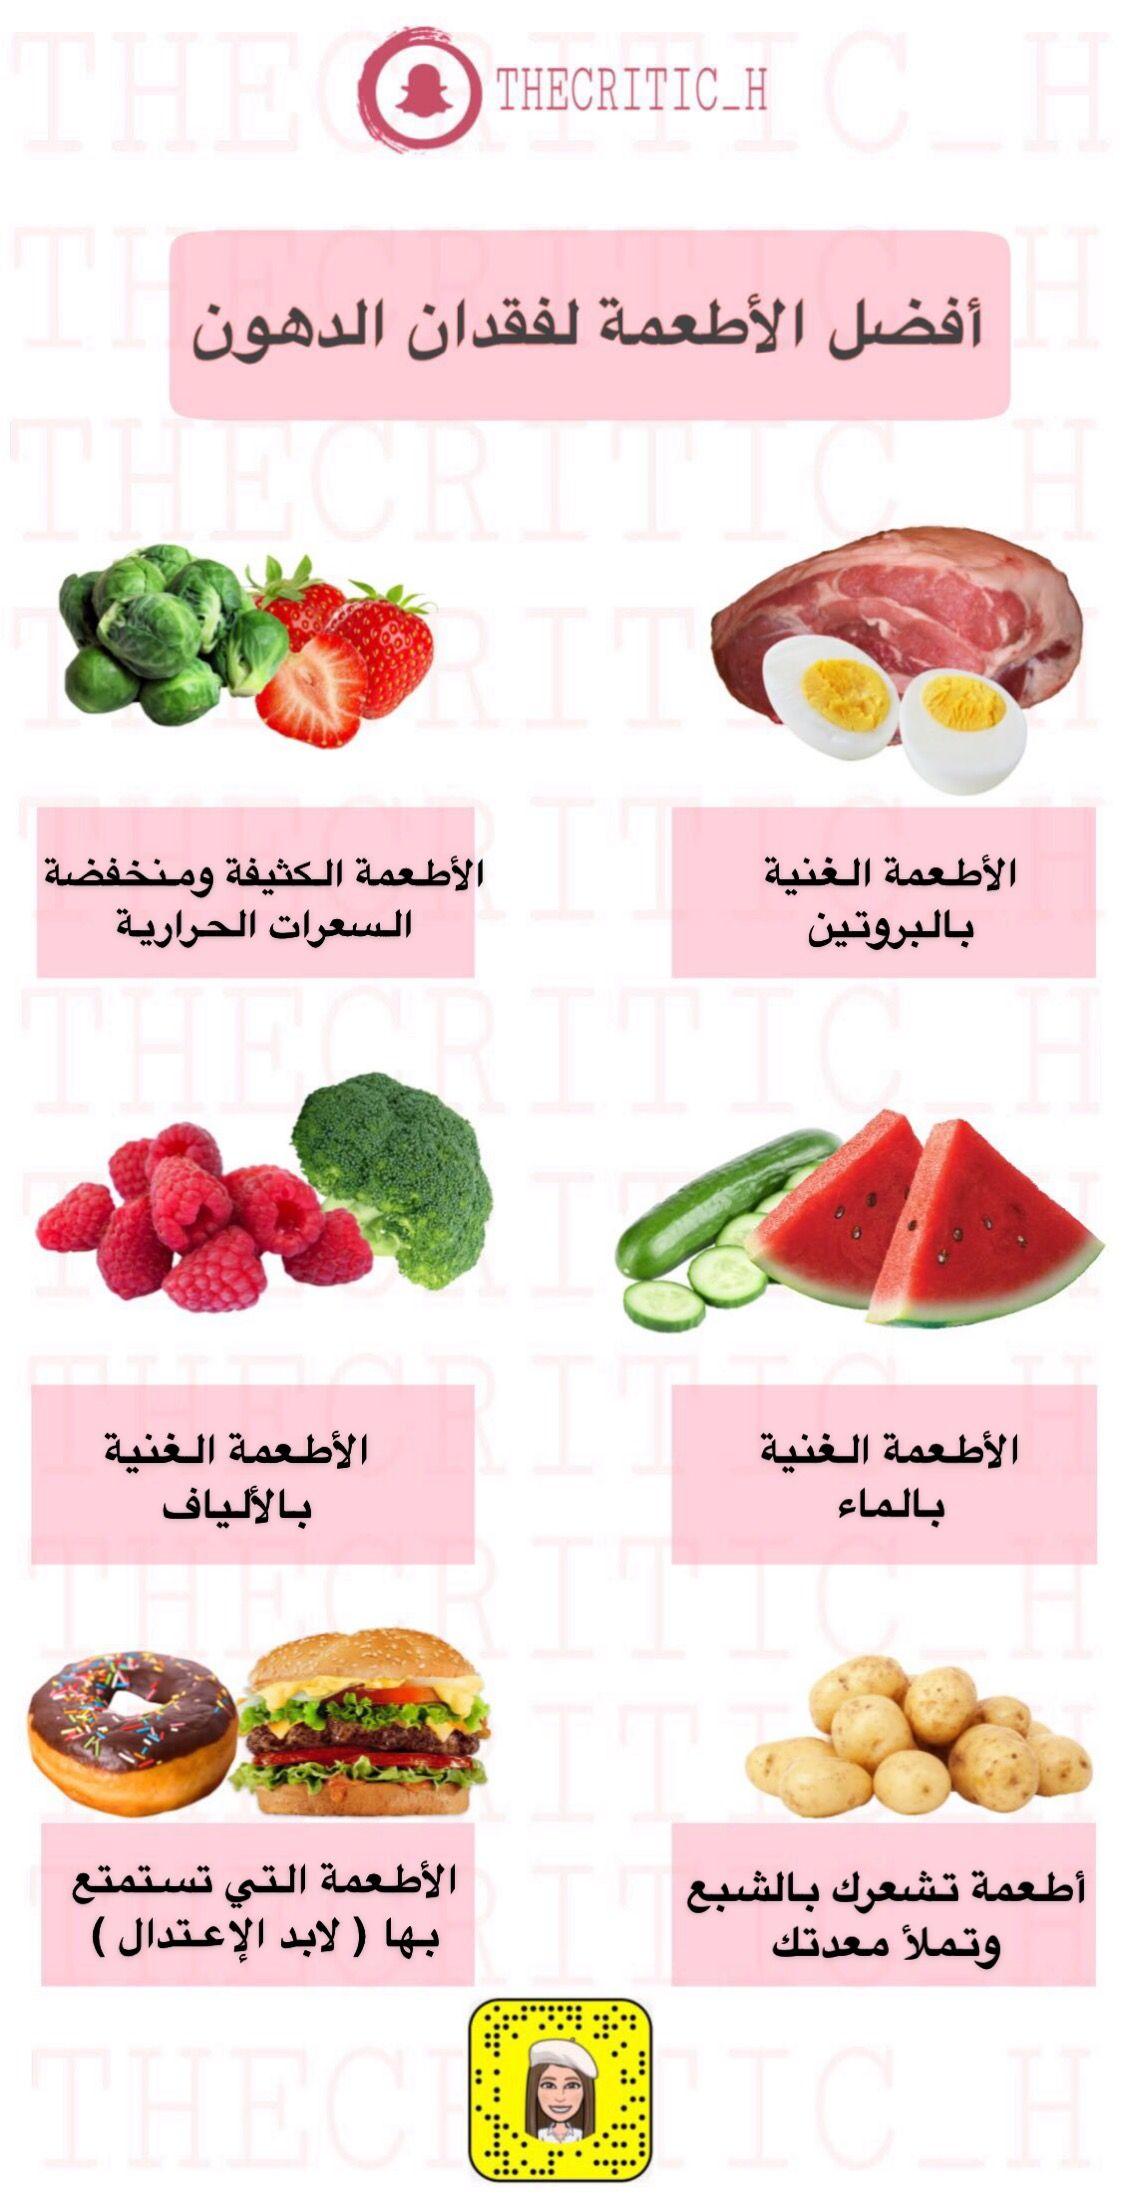 فقدان الدهون Health Fitness Nutrition Health Facts Fitness Food Facts